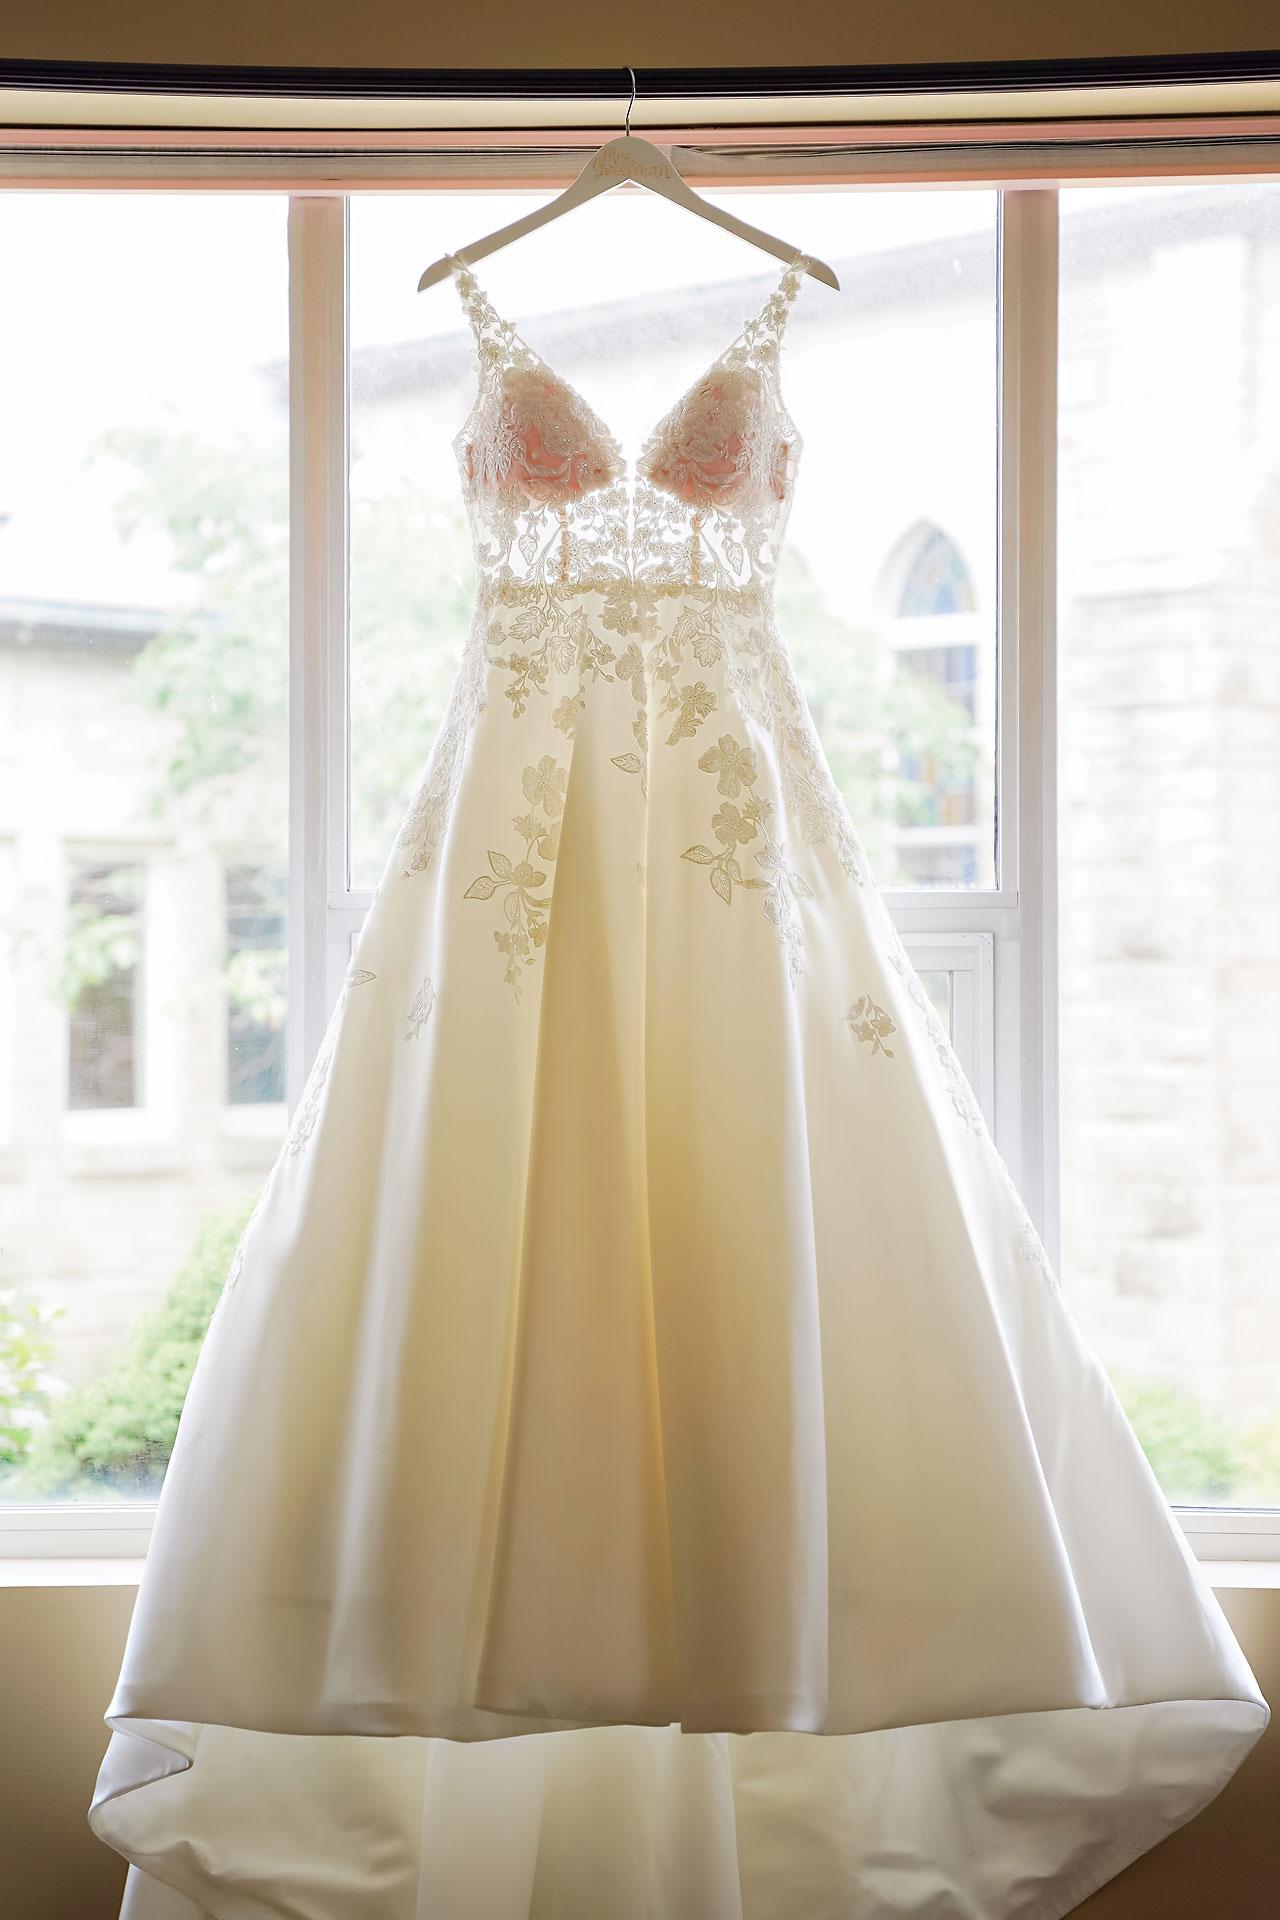 Michelle Casey Palais Royale South Bend Wedding 005